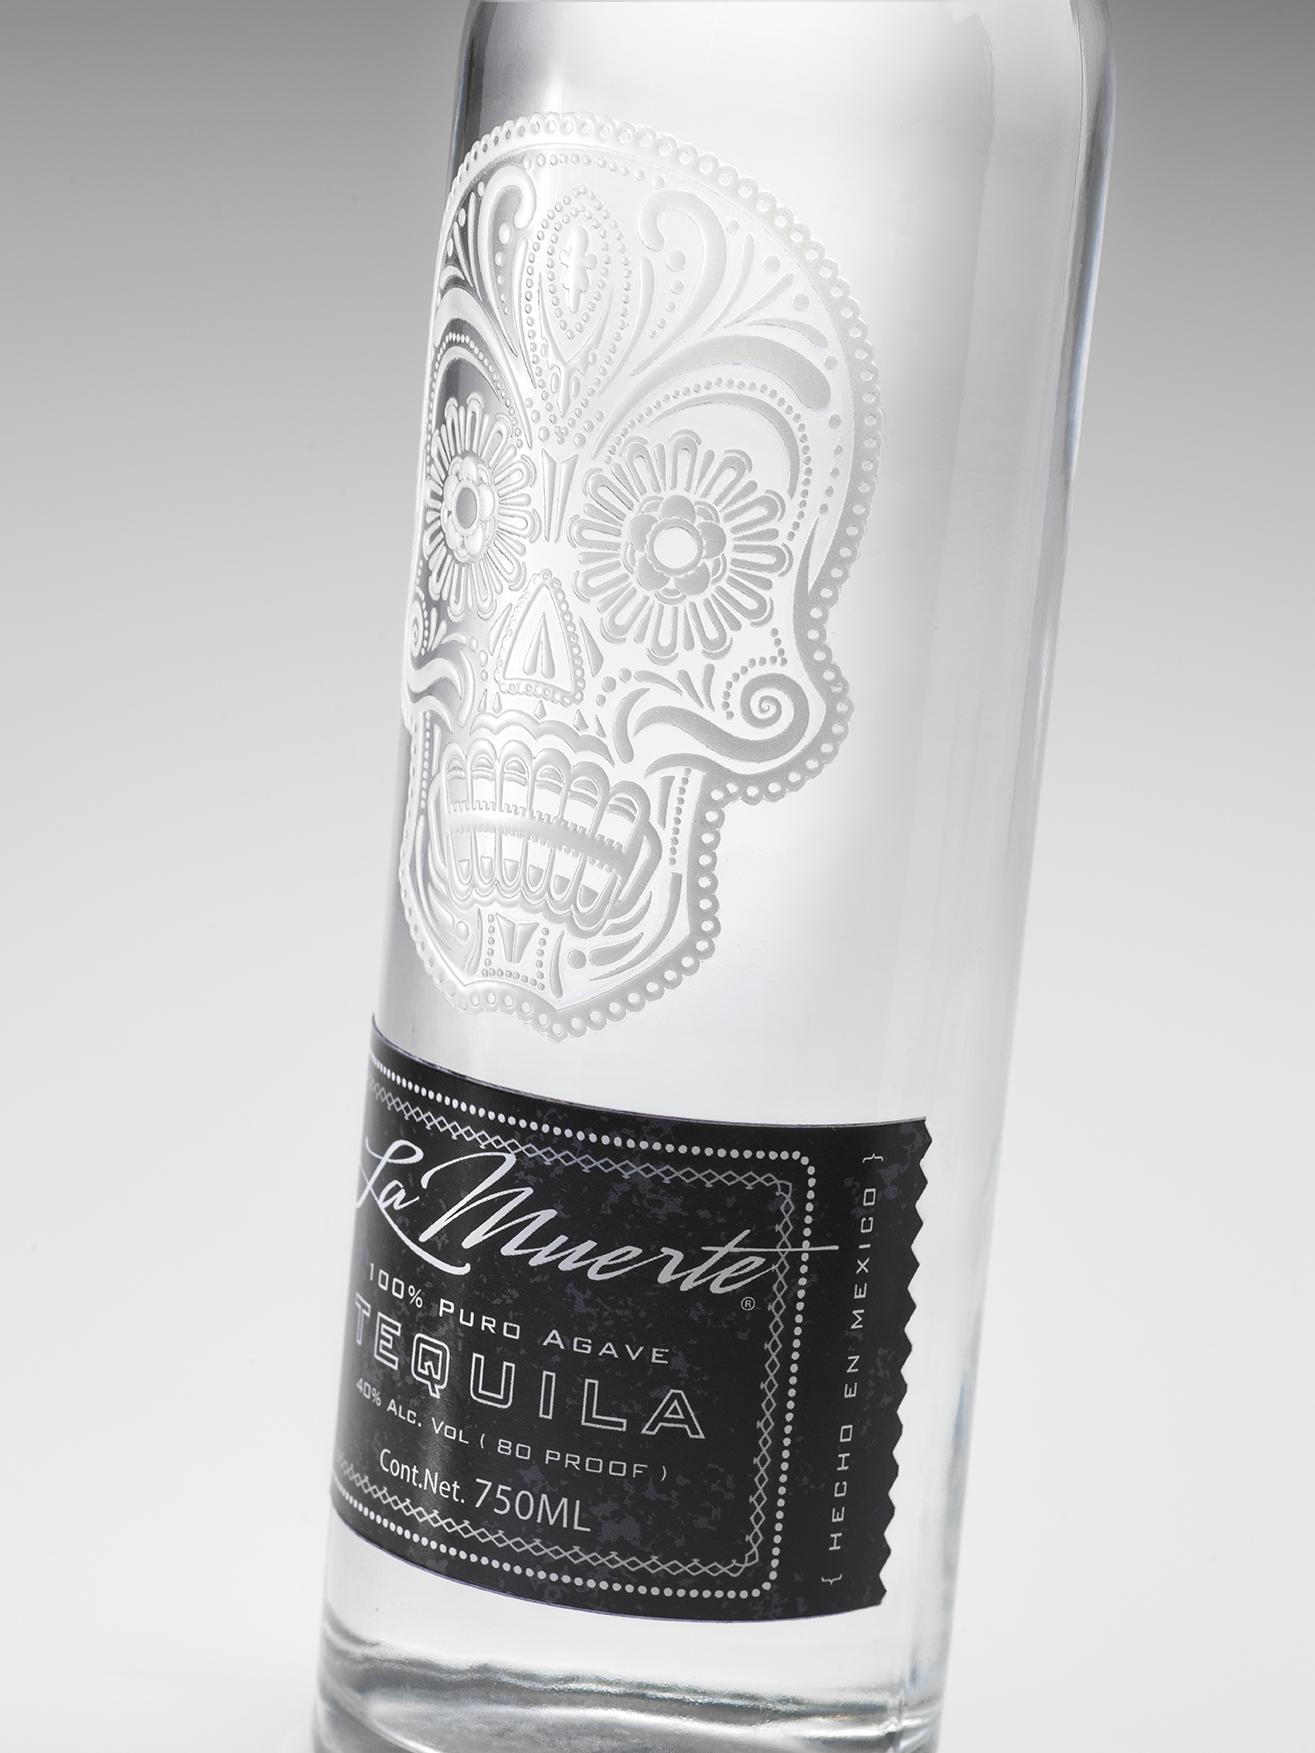 La Muerte Skull Tequila - Phase1 Prototypes